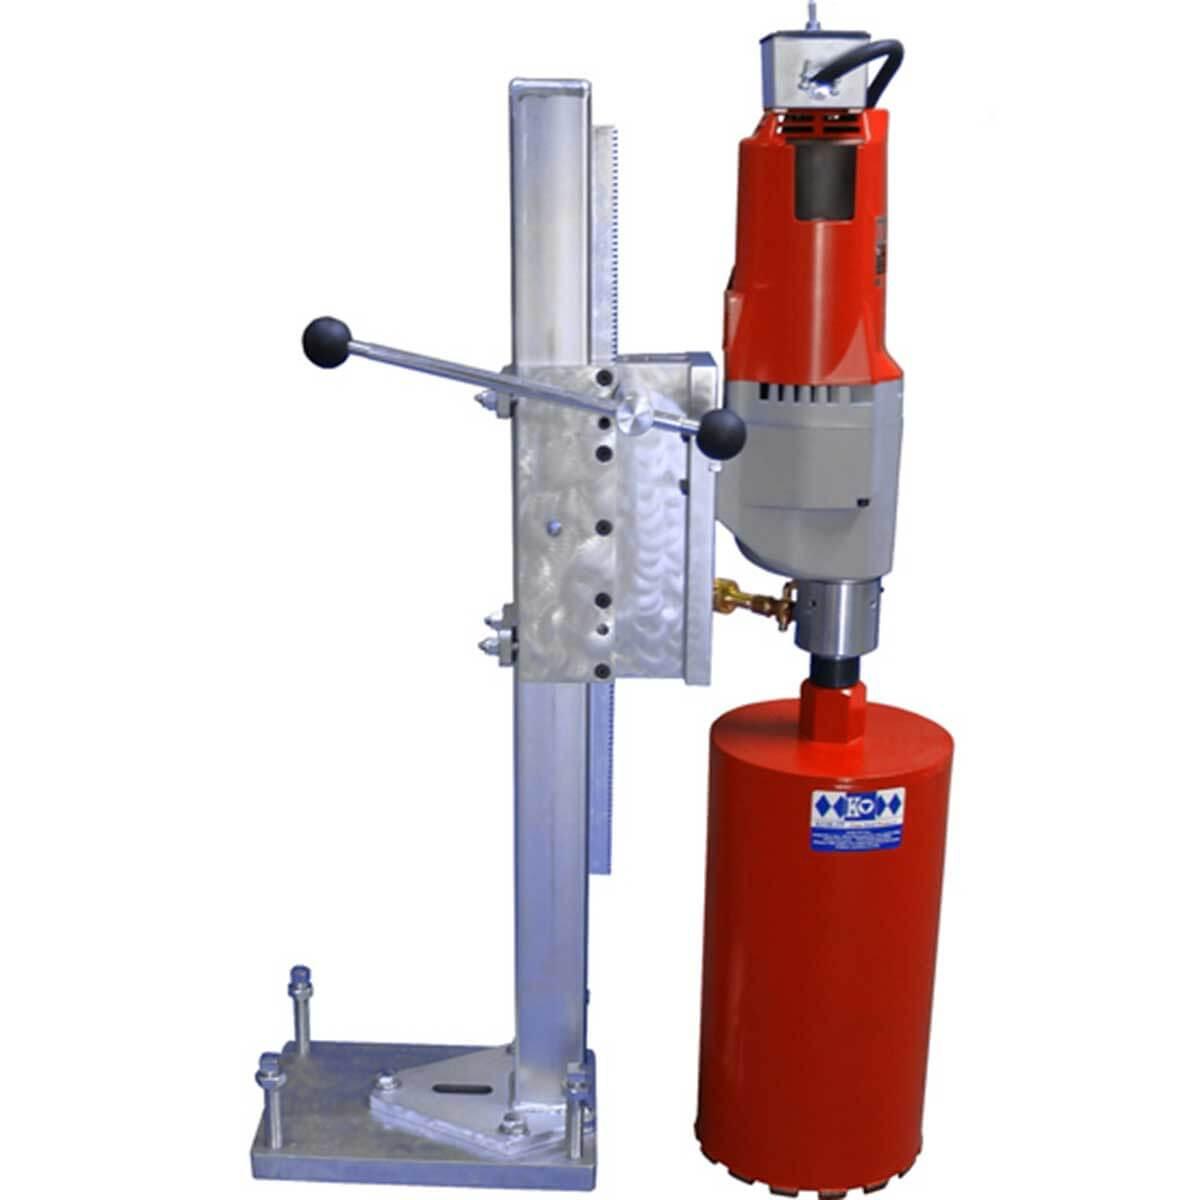 Kor-It K-90 electric Core Drill